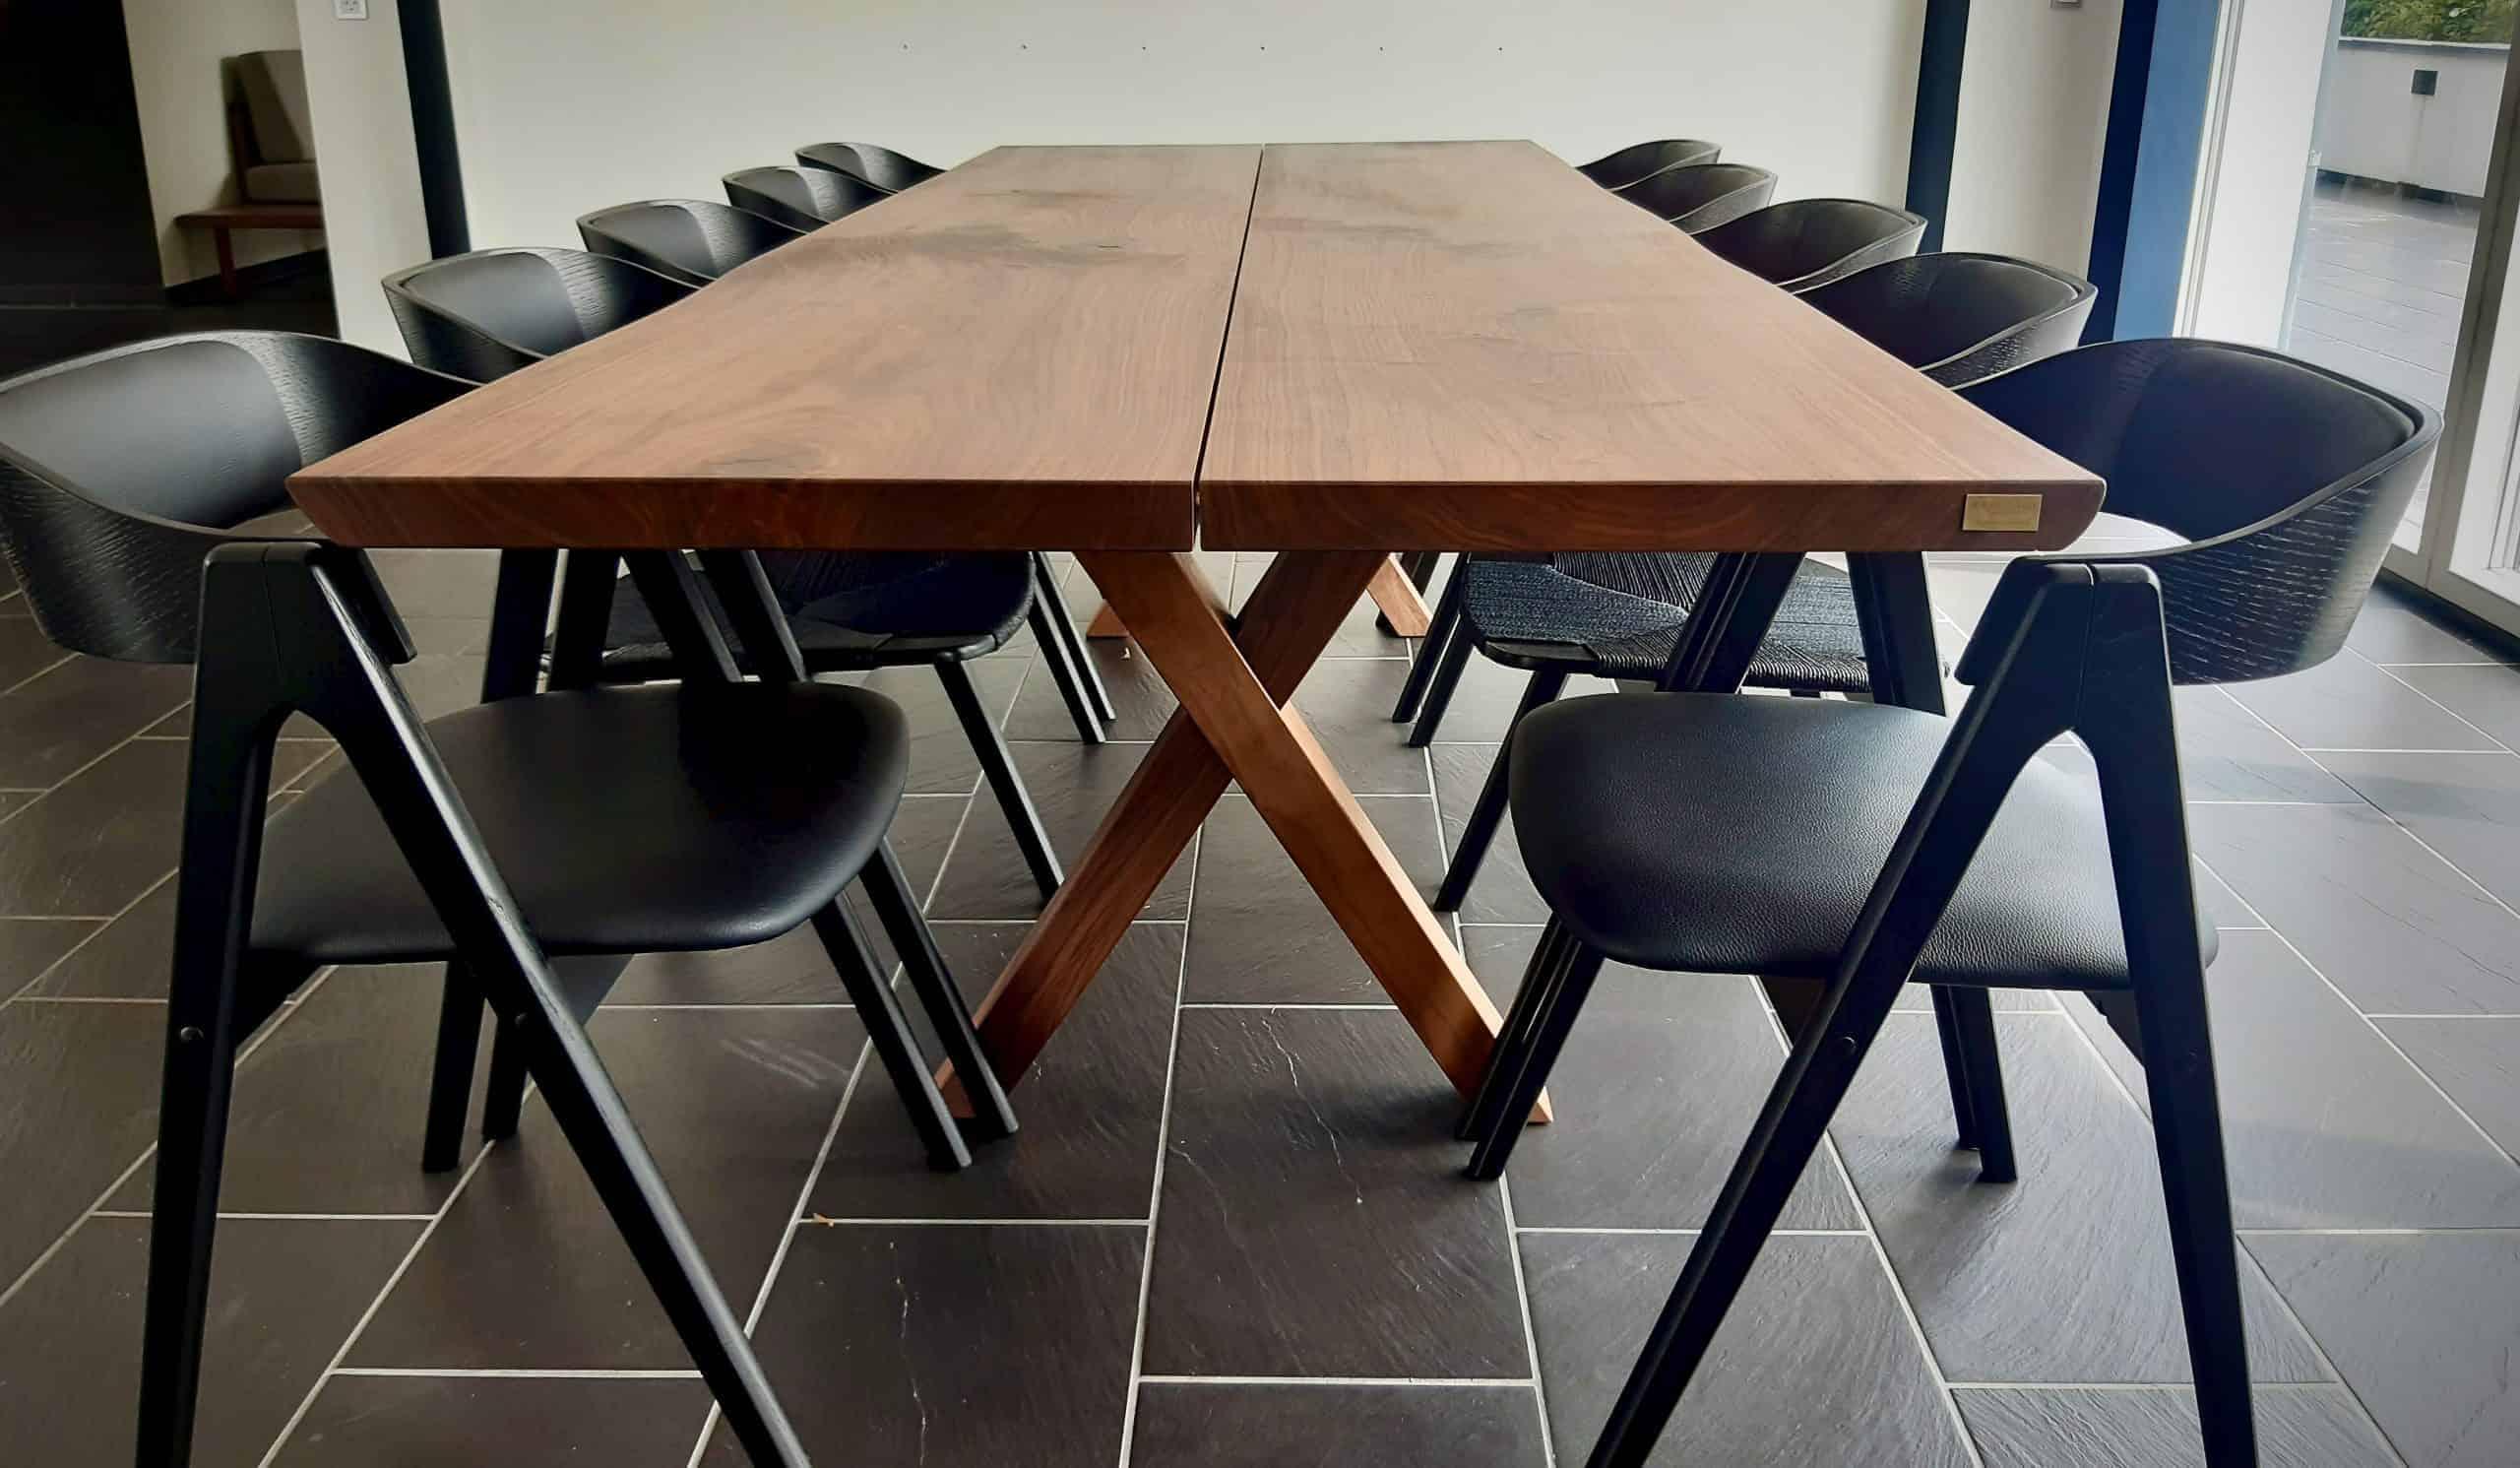 plankebord planke bord i trae Kaerbygård 15 scaled